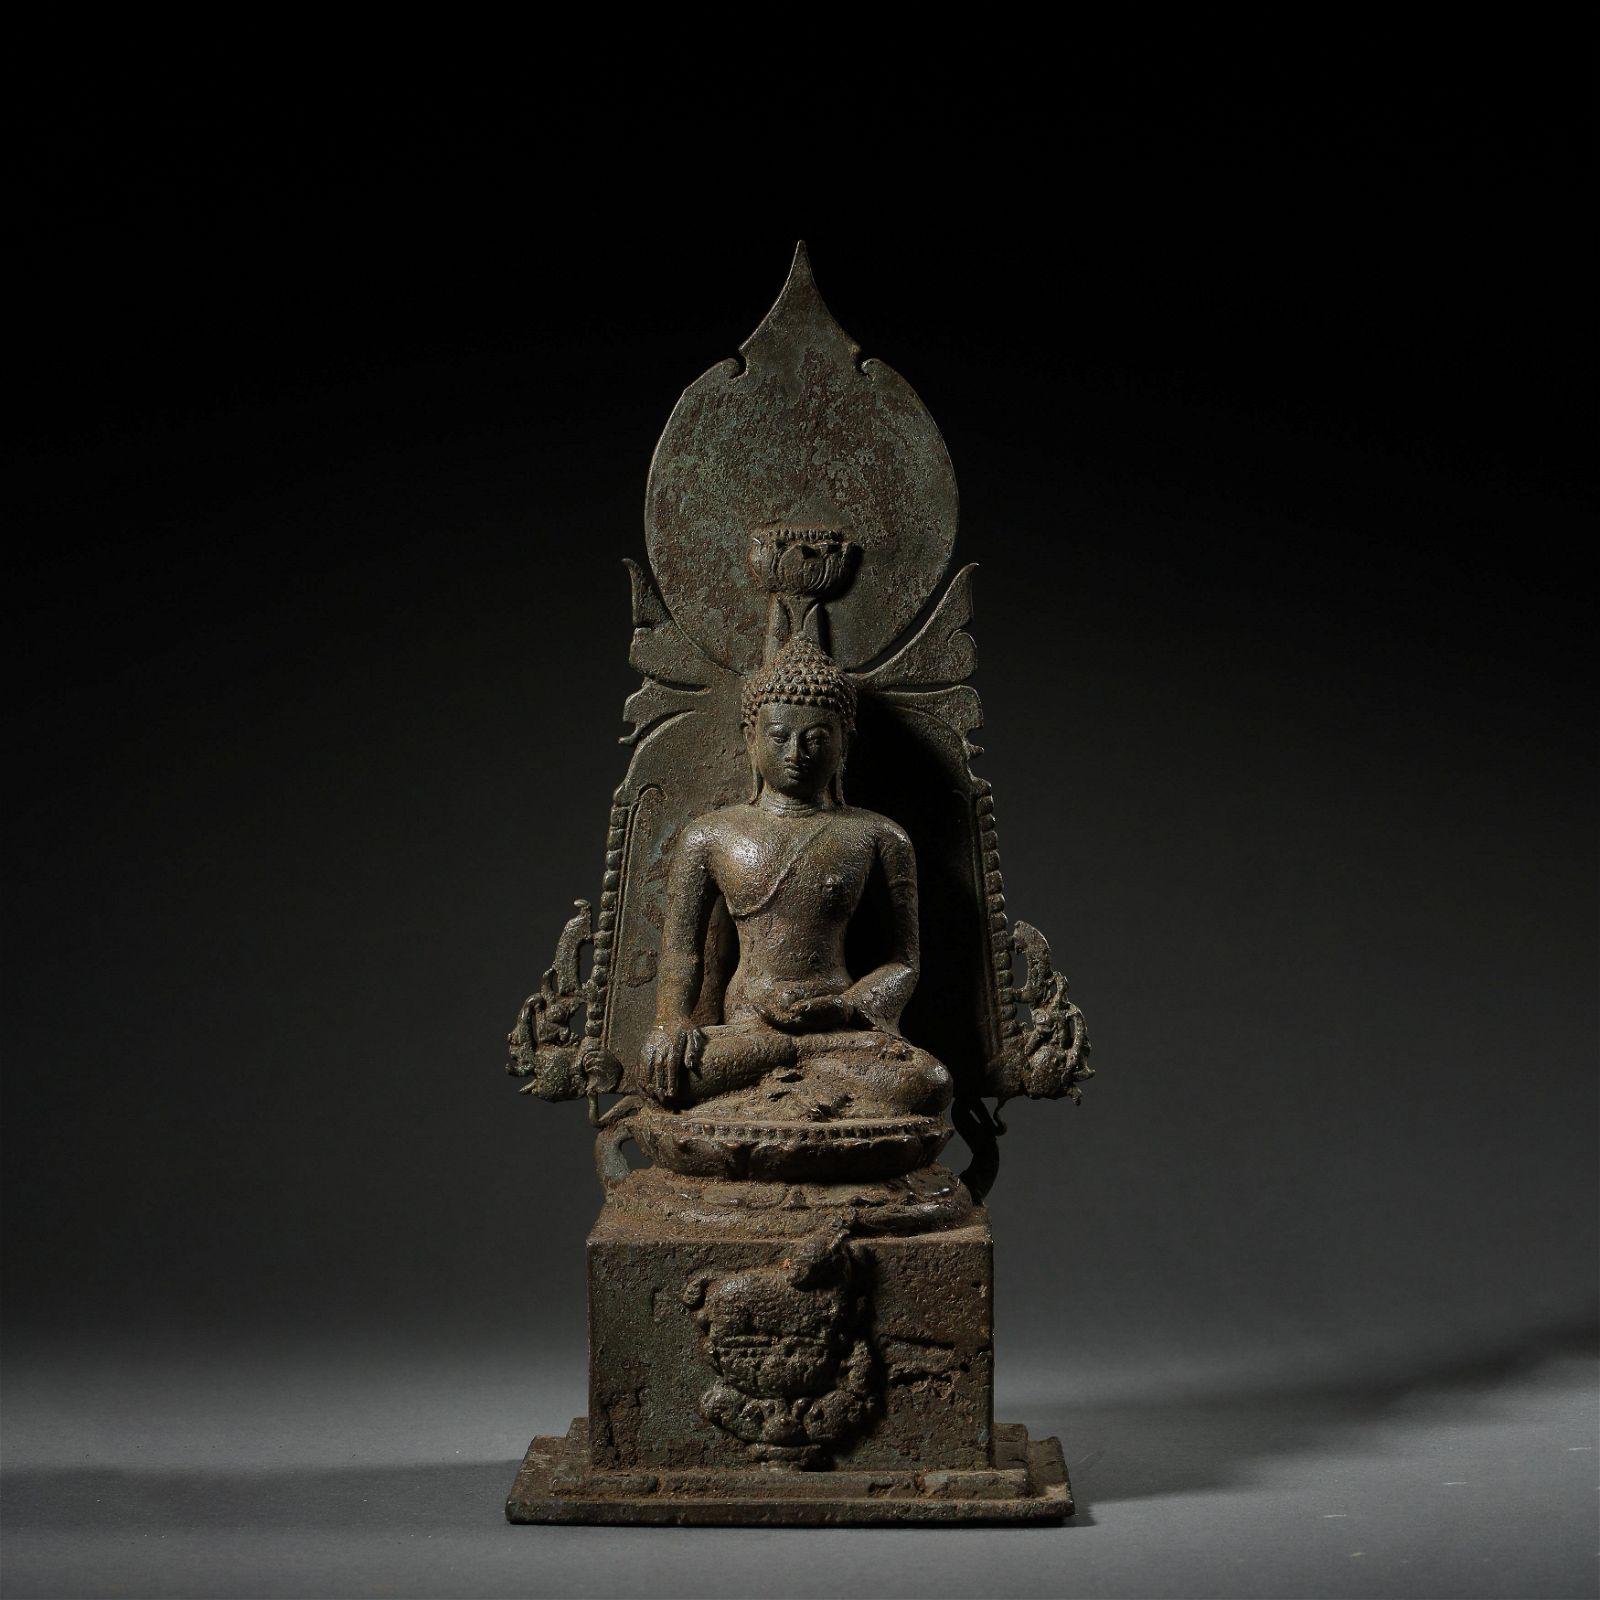 ANCIENT BRONZE BUDDHA STATUE IN INDIA